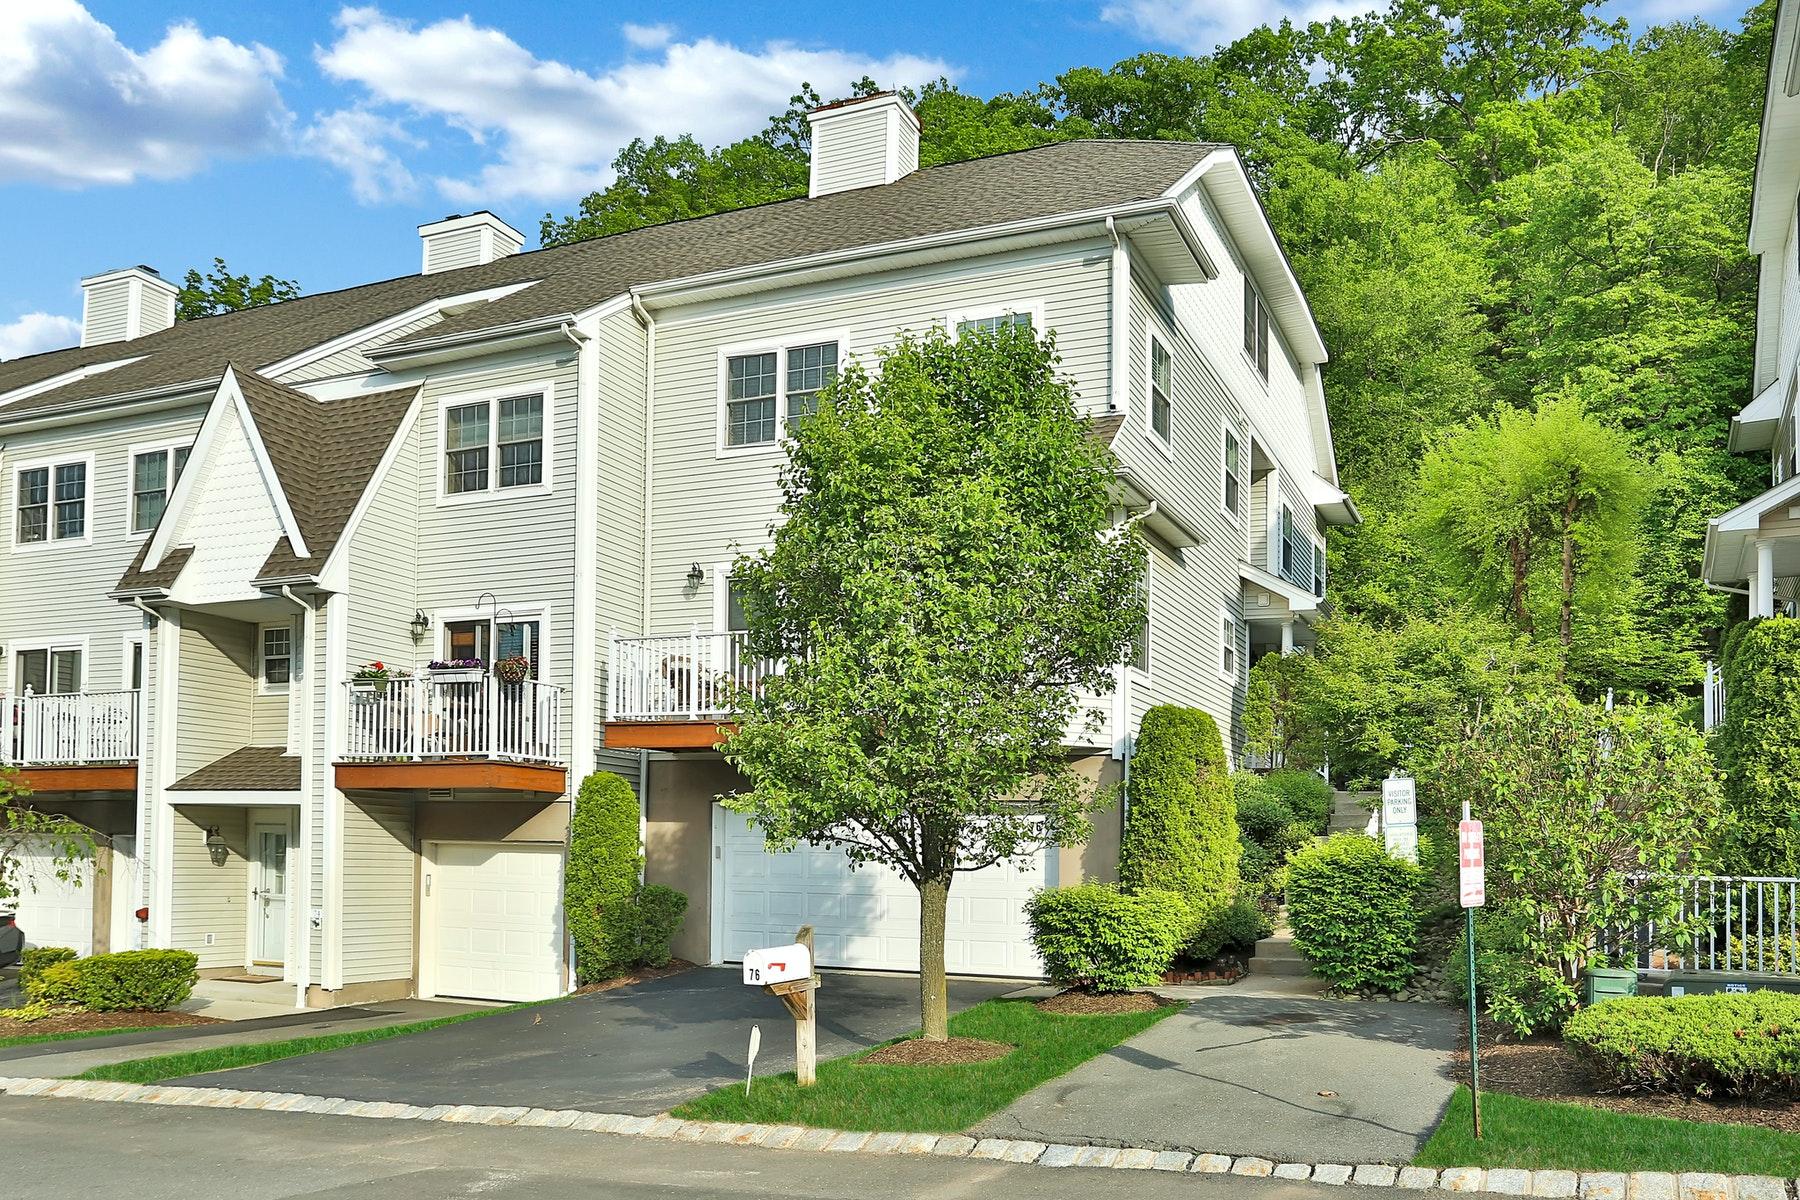 Condominiums 為 出售 在 End Unit Beauty 76 Crystal Hill Drive, Pomona, 纽约 10970 美國